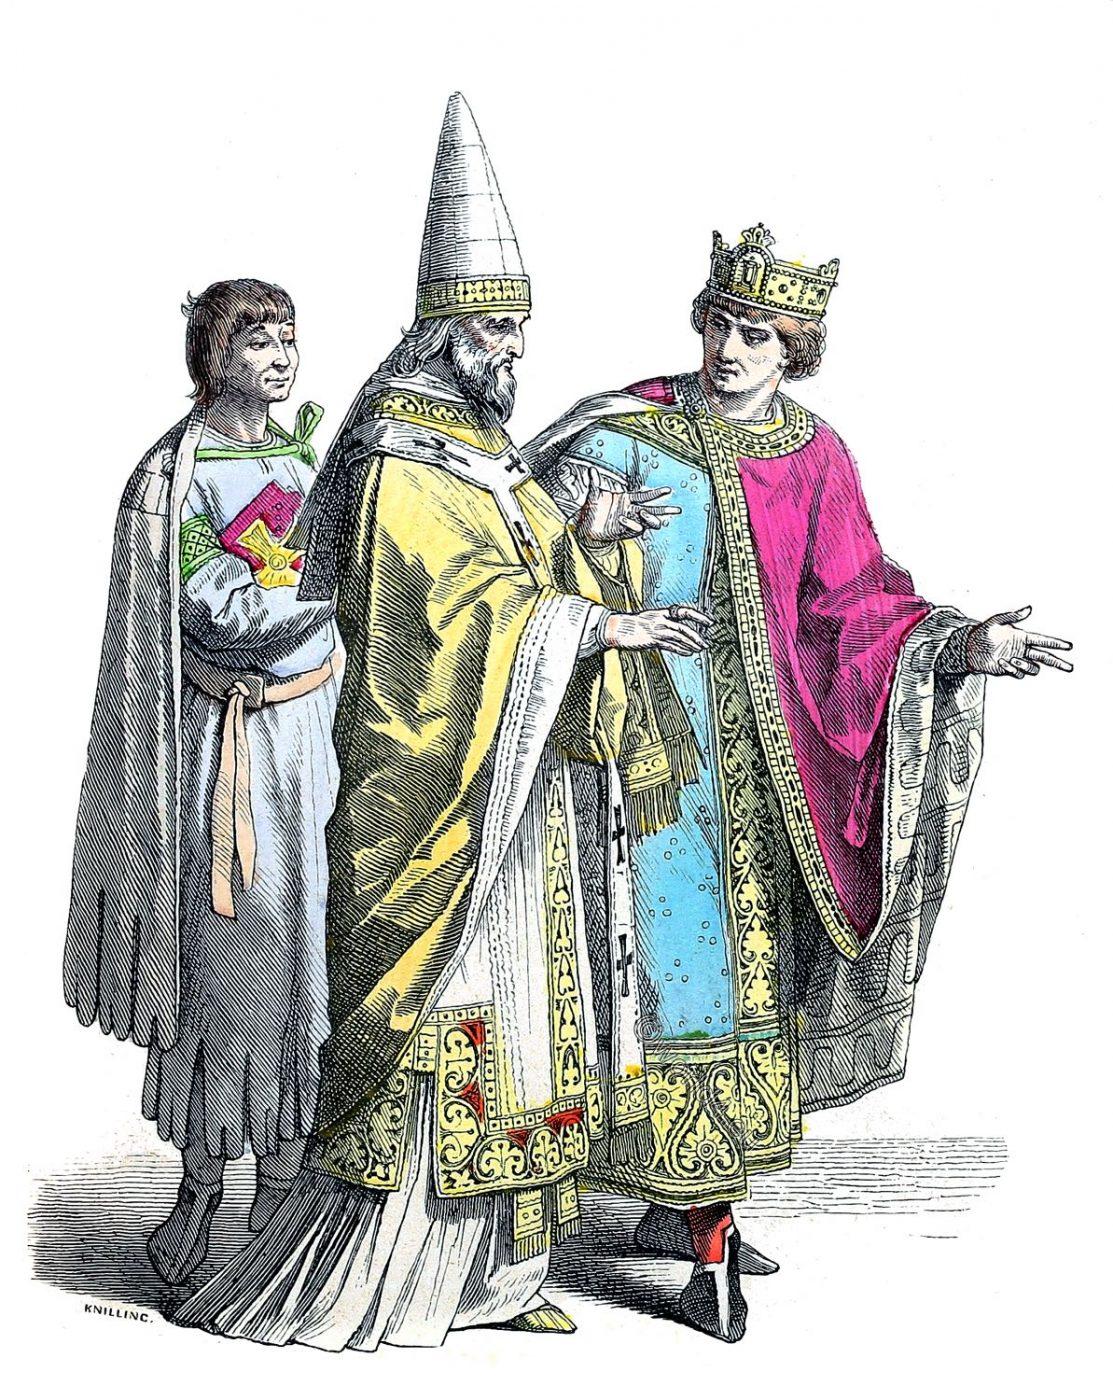 Münchener Bilderbogen, Servant, Roman pope, German king, middle ages, fashion, costumes